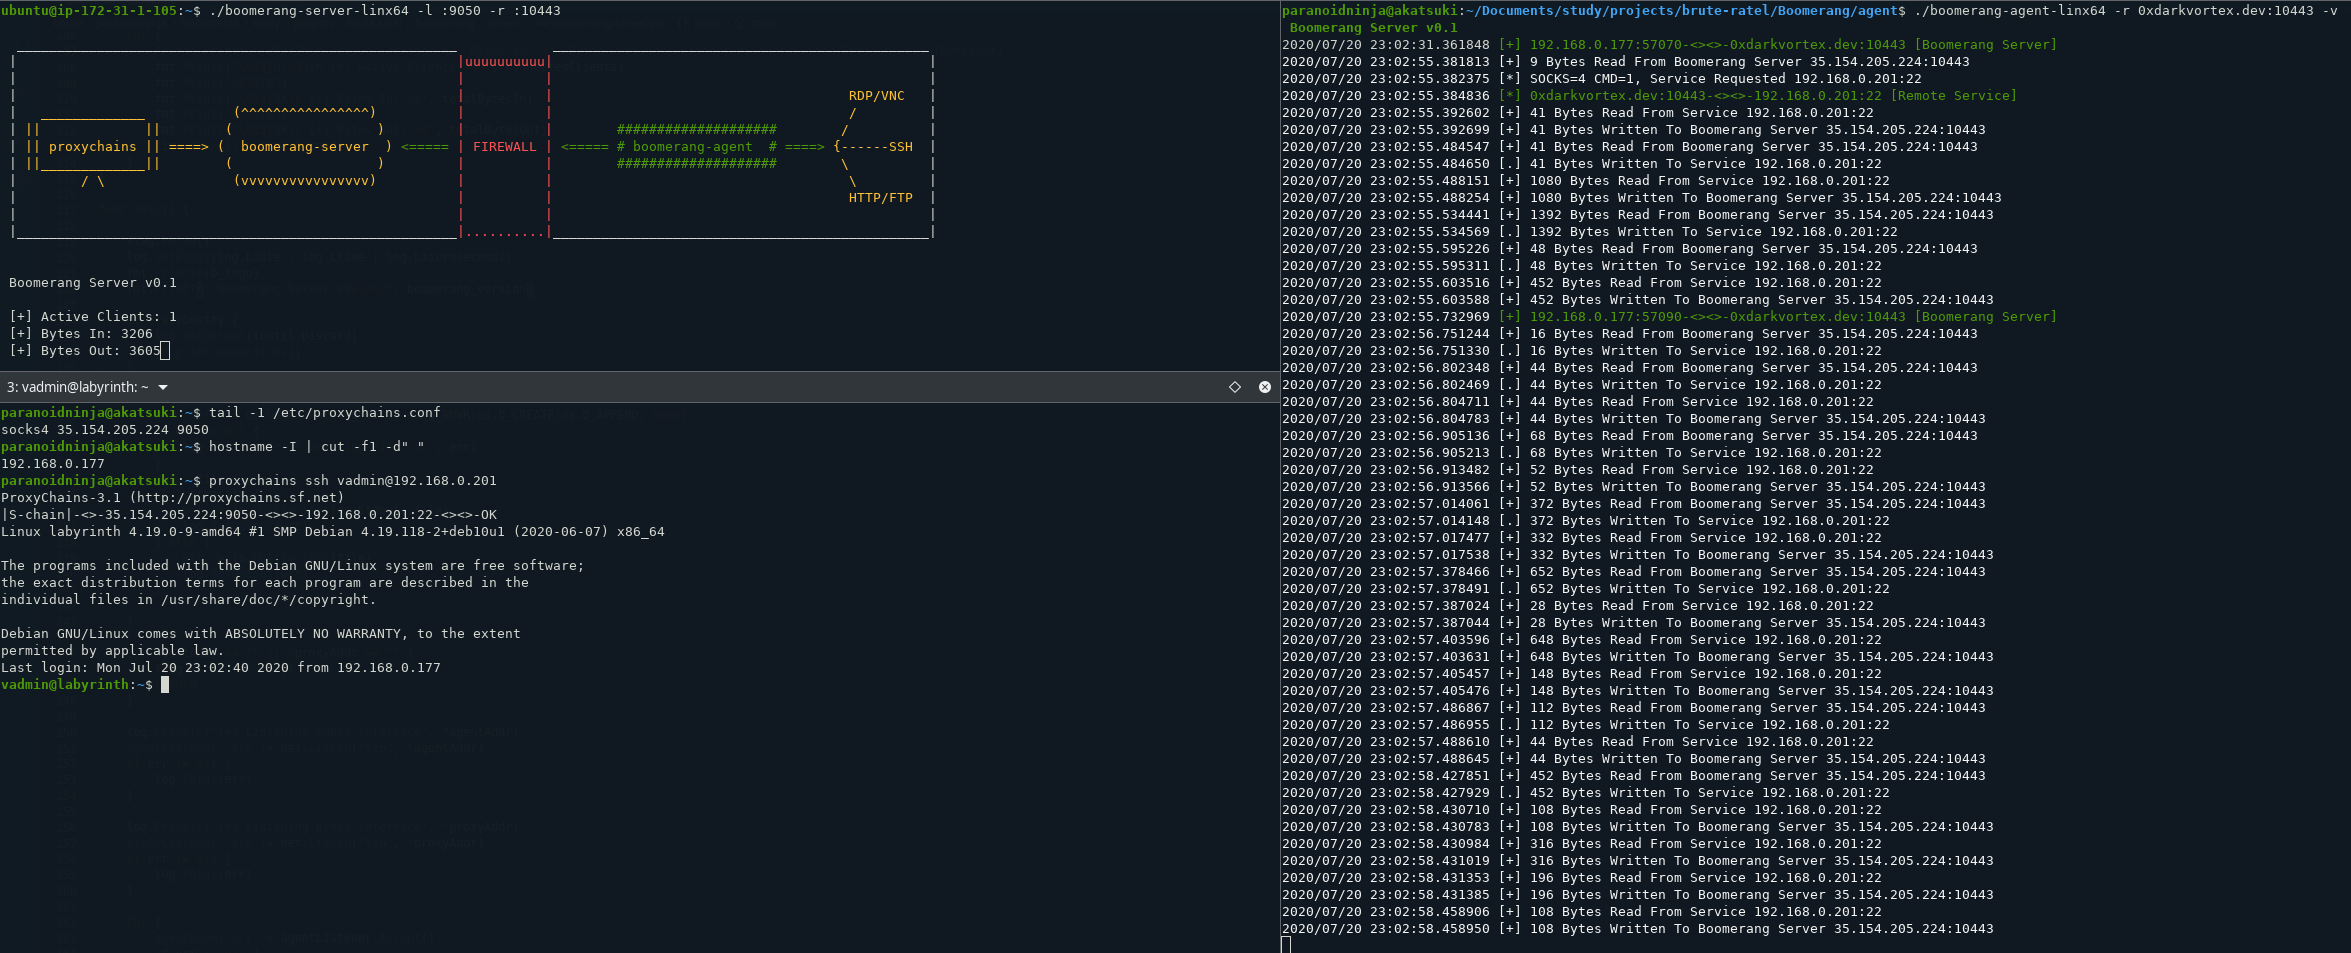 Boomerang: expose multiple internal servers to web/cloud